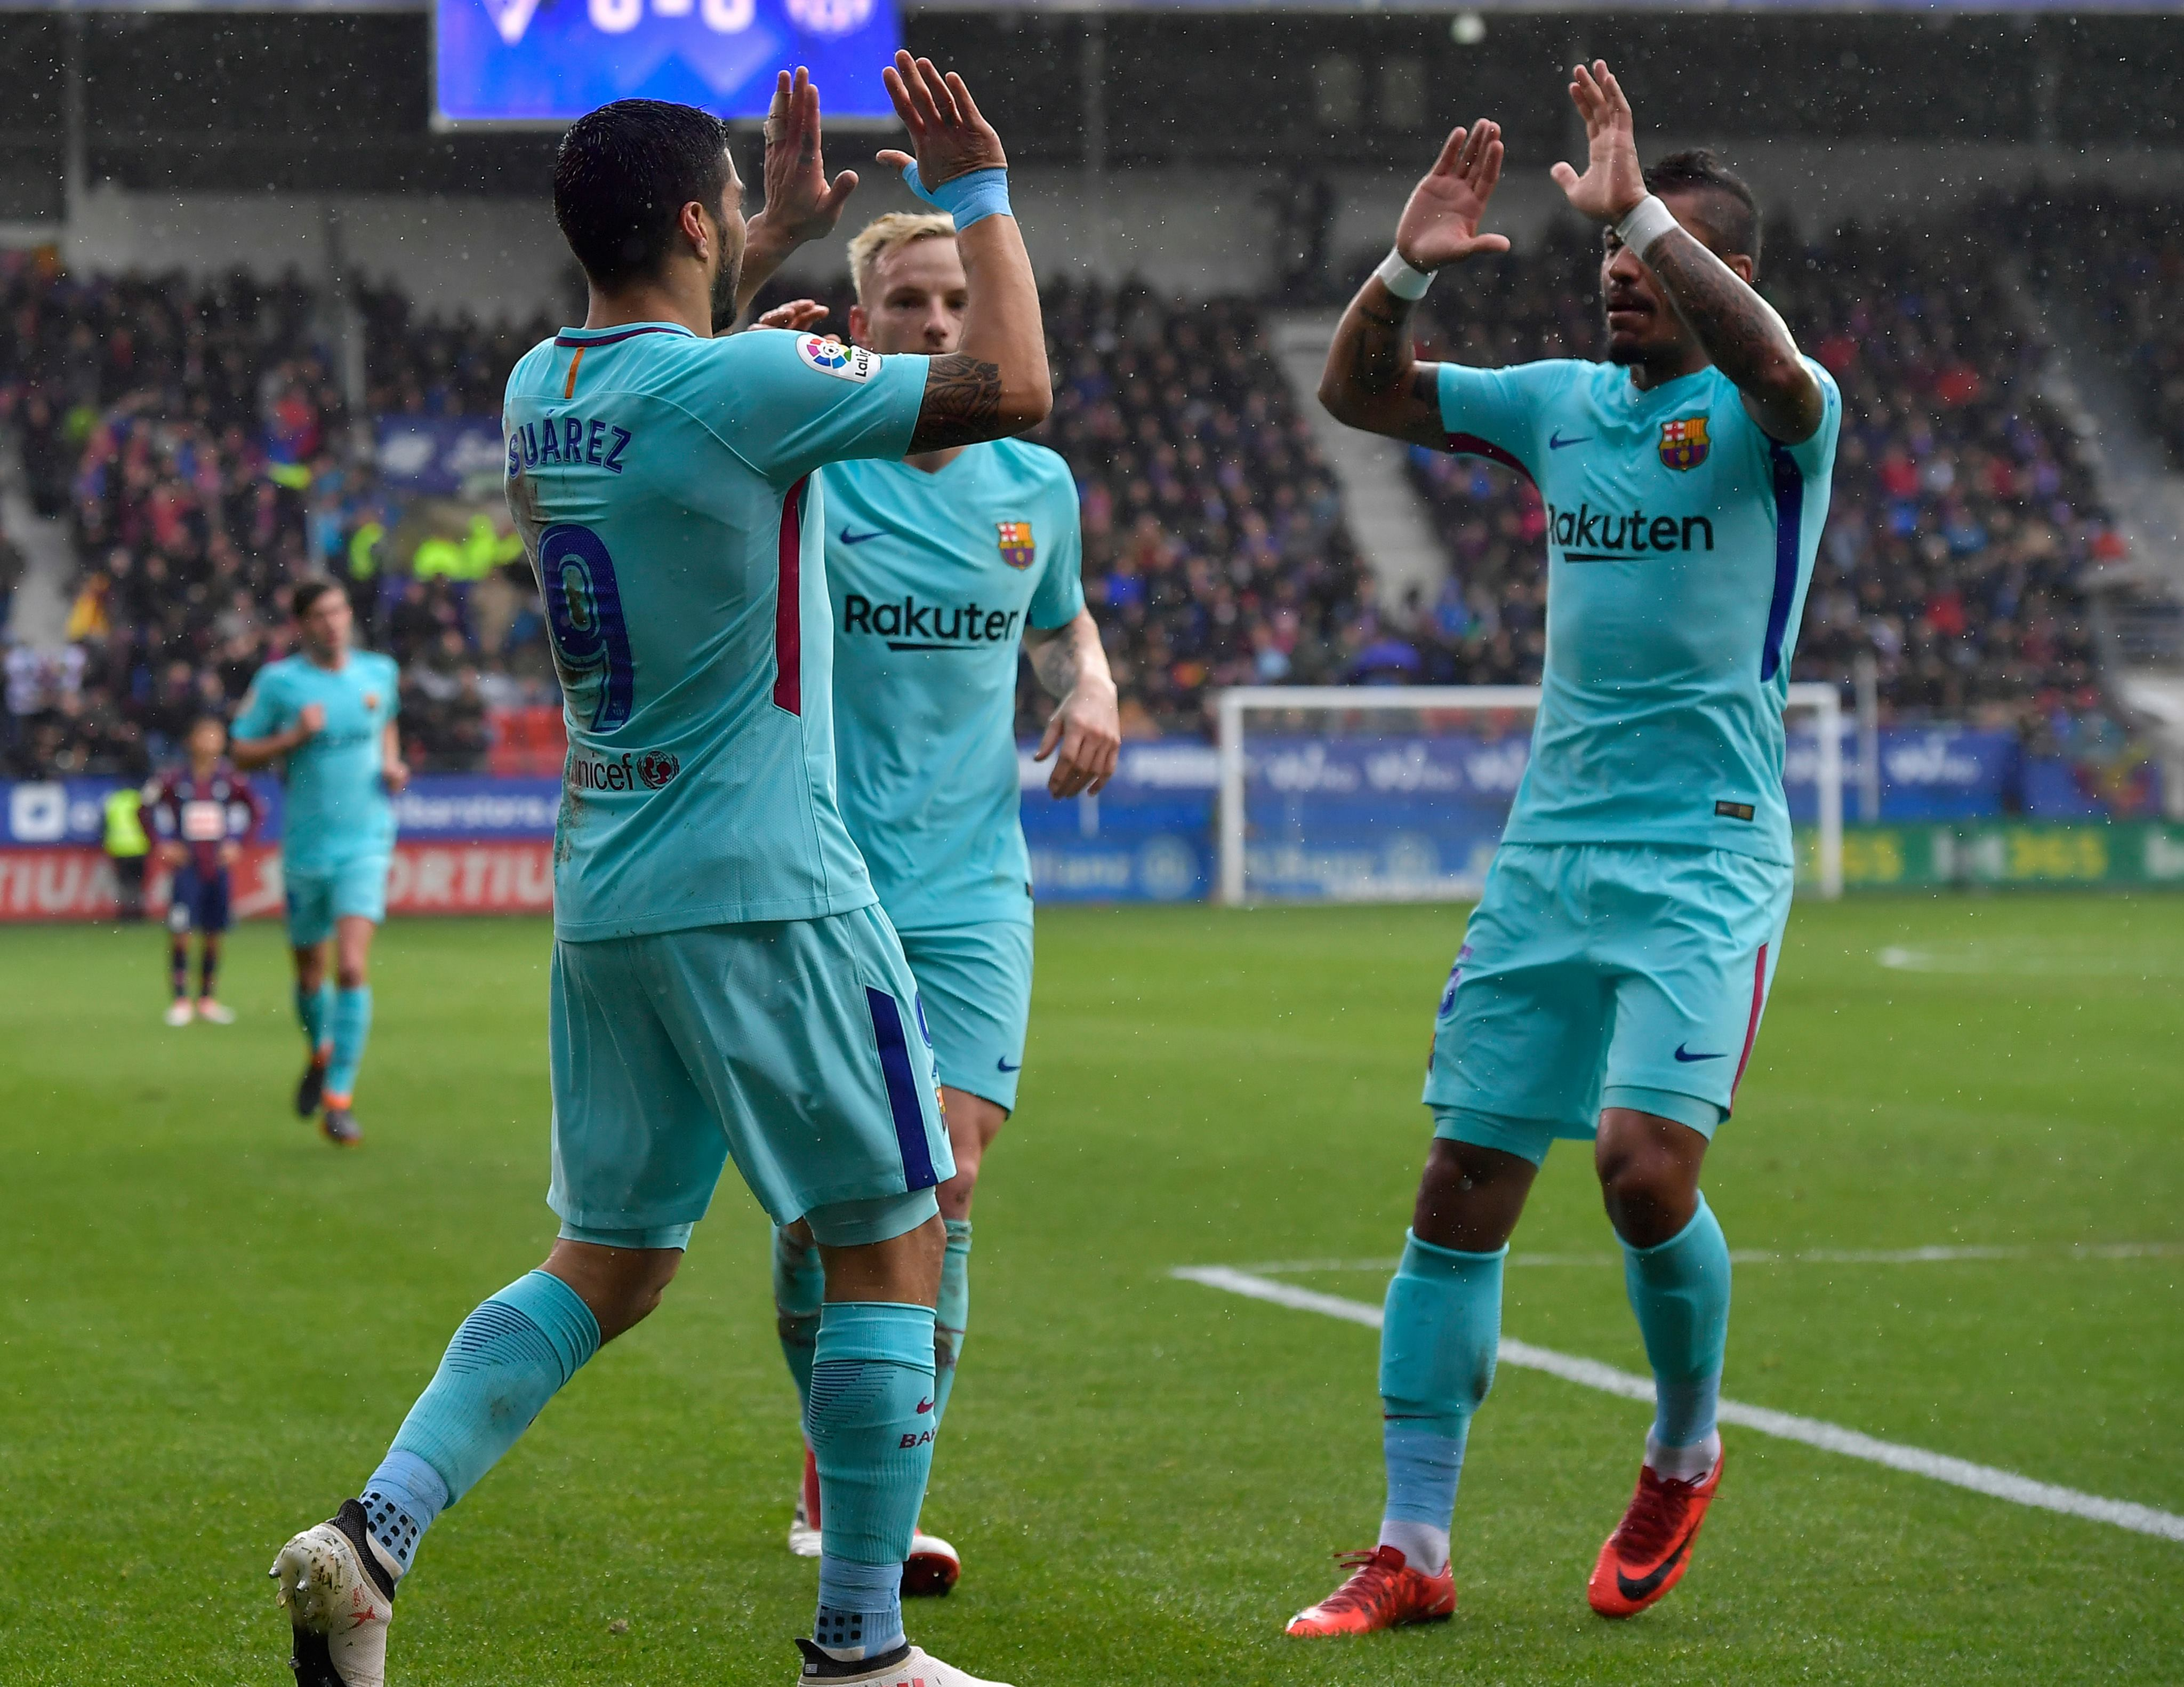 Barcelona celebrate scoring their opener against Eibar. Image: PA Images.